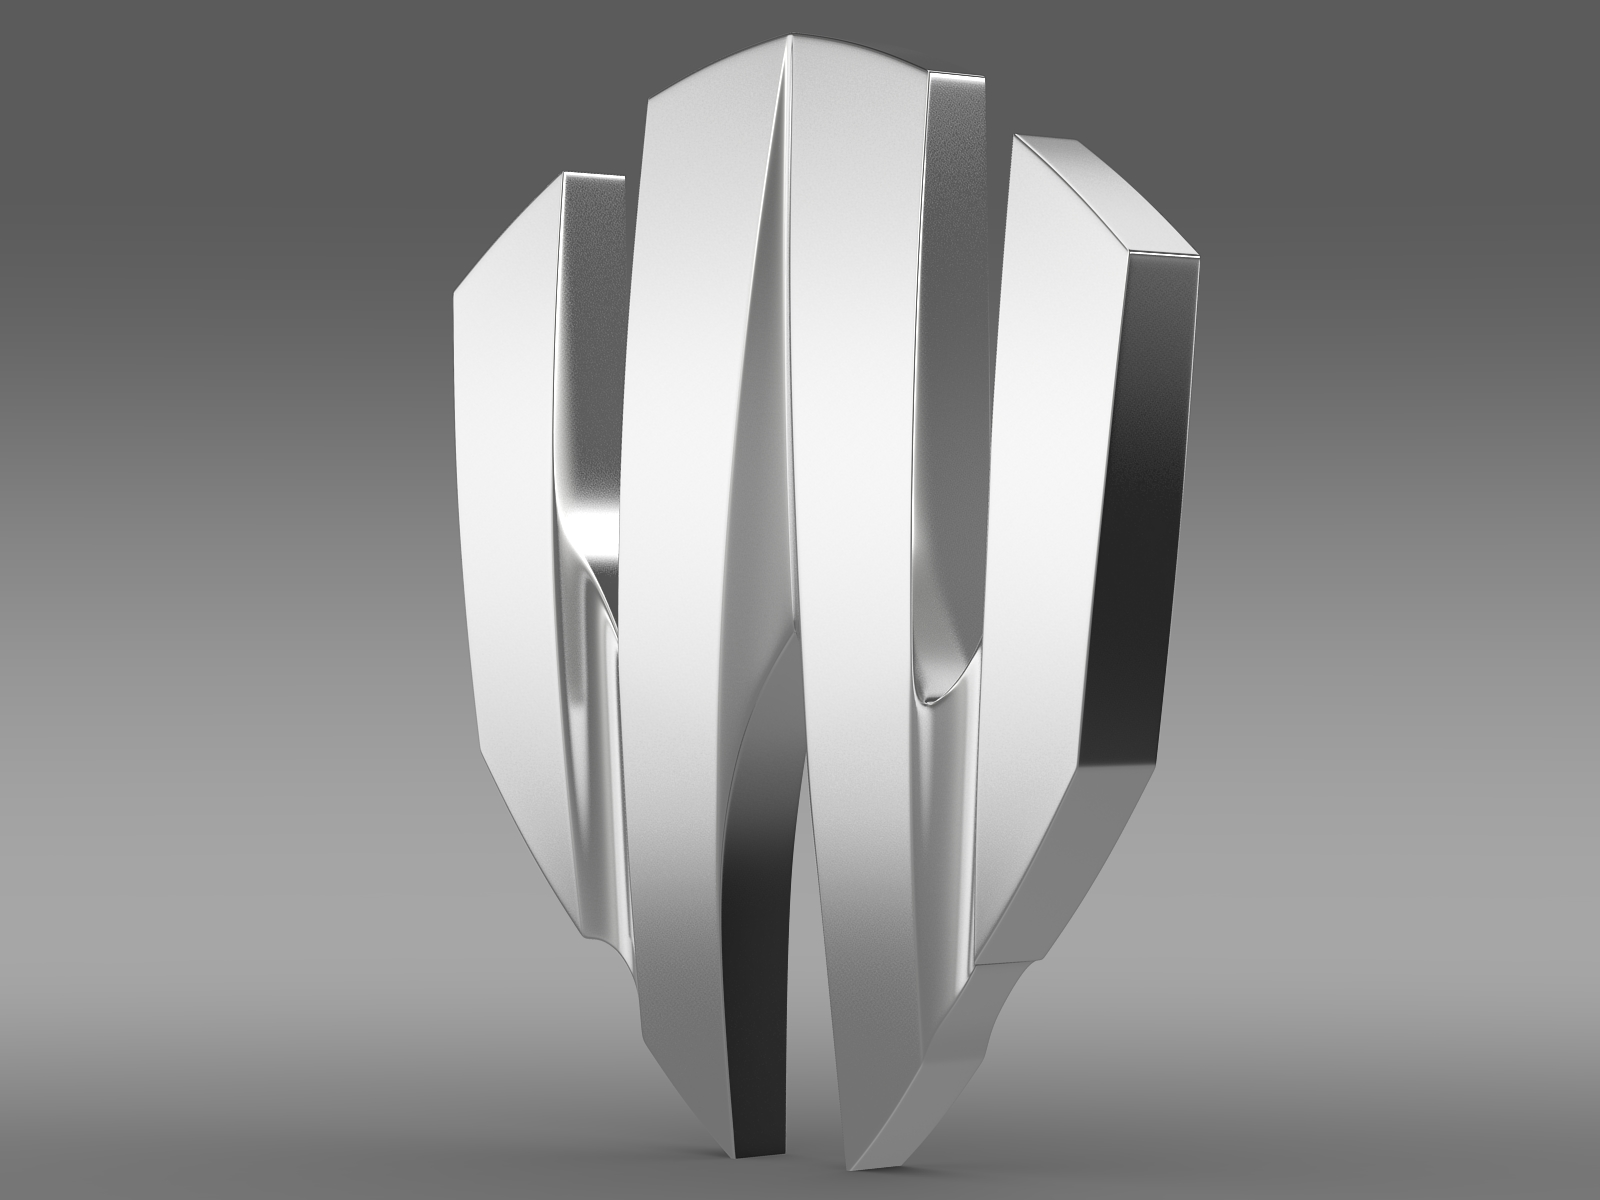 W Motors Lykan Hypersport logo 3d model 3ds max fbx c4d lwo lws lw ma mb  obj 213242